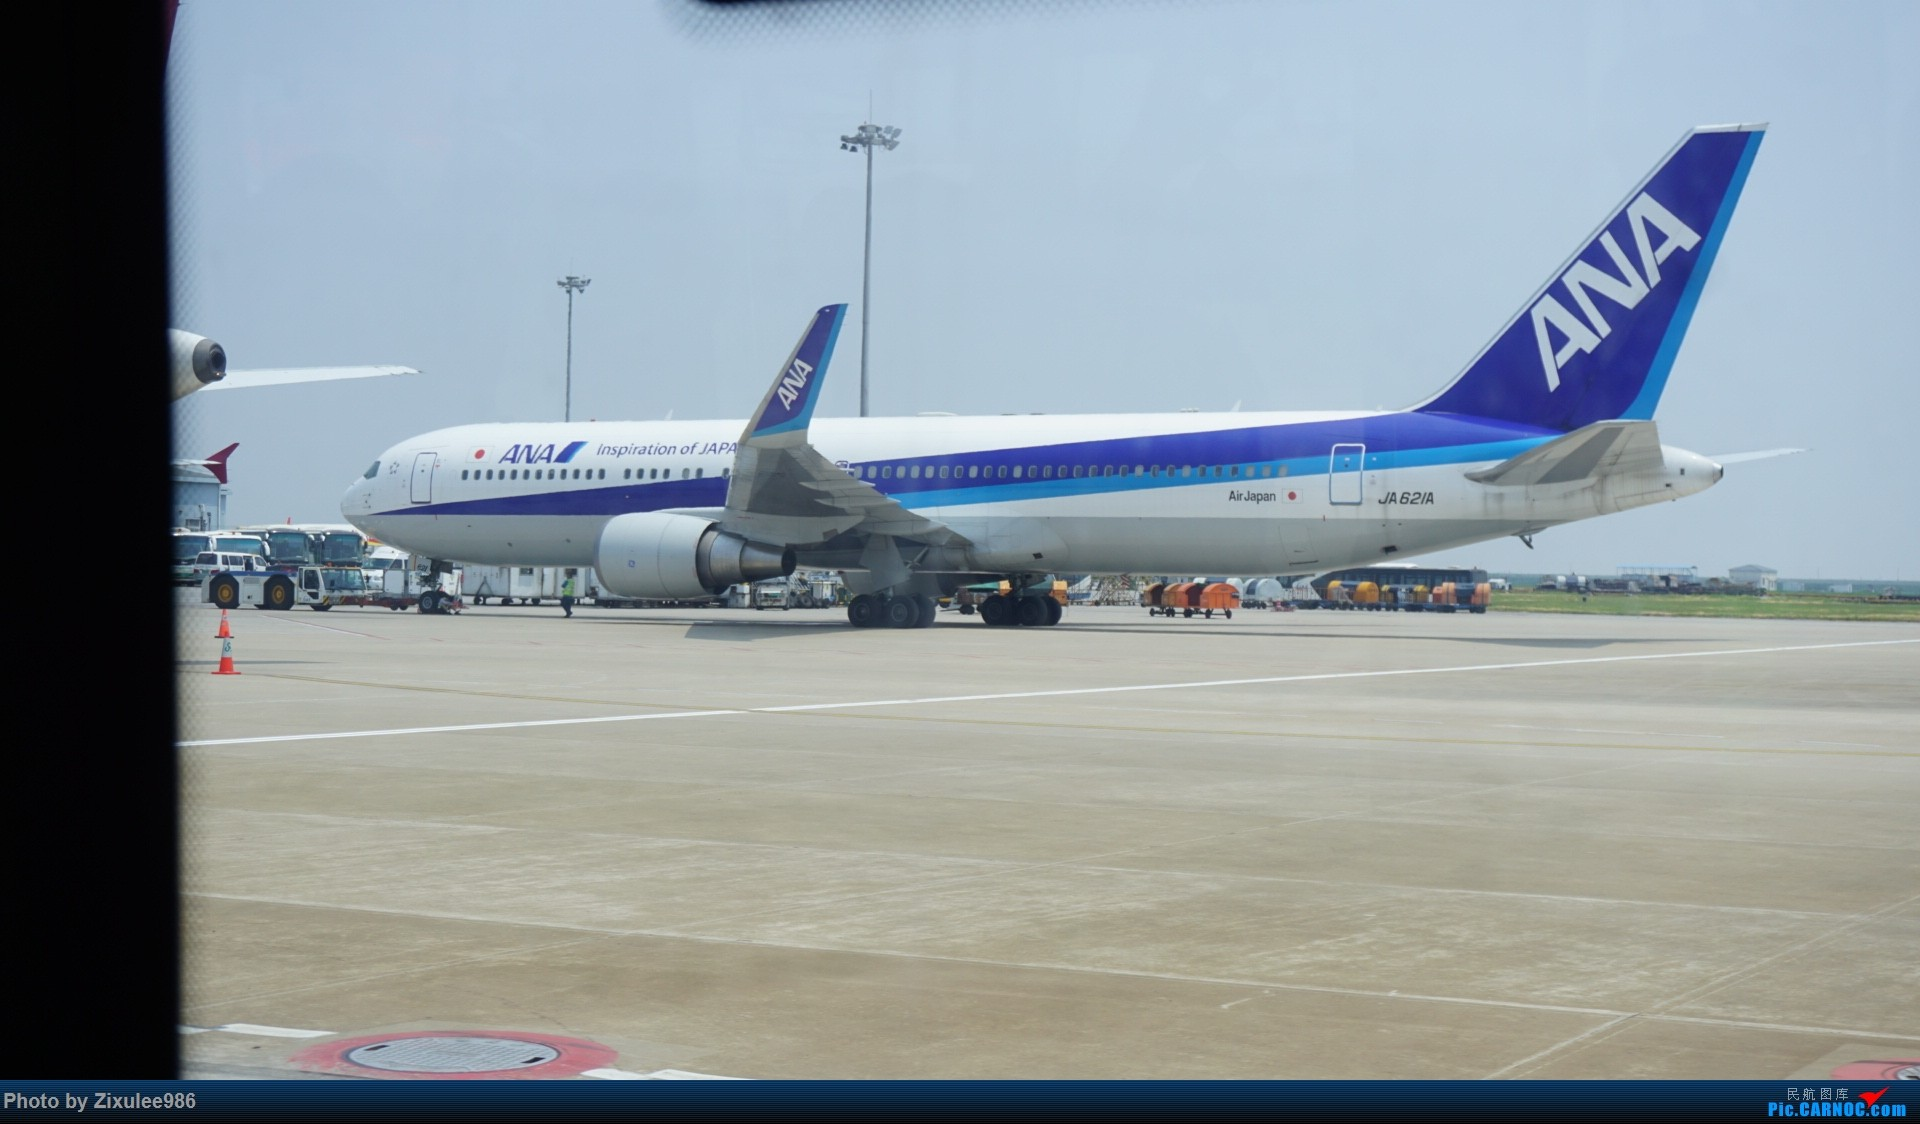 【PVG】Jul.26th MF8057抵达后的拍机(多图)-part1 BOEING 767-381ER JA621A 中国上海浦东国际机场